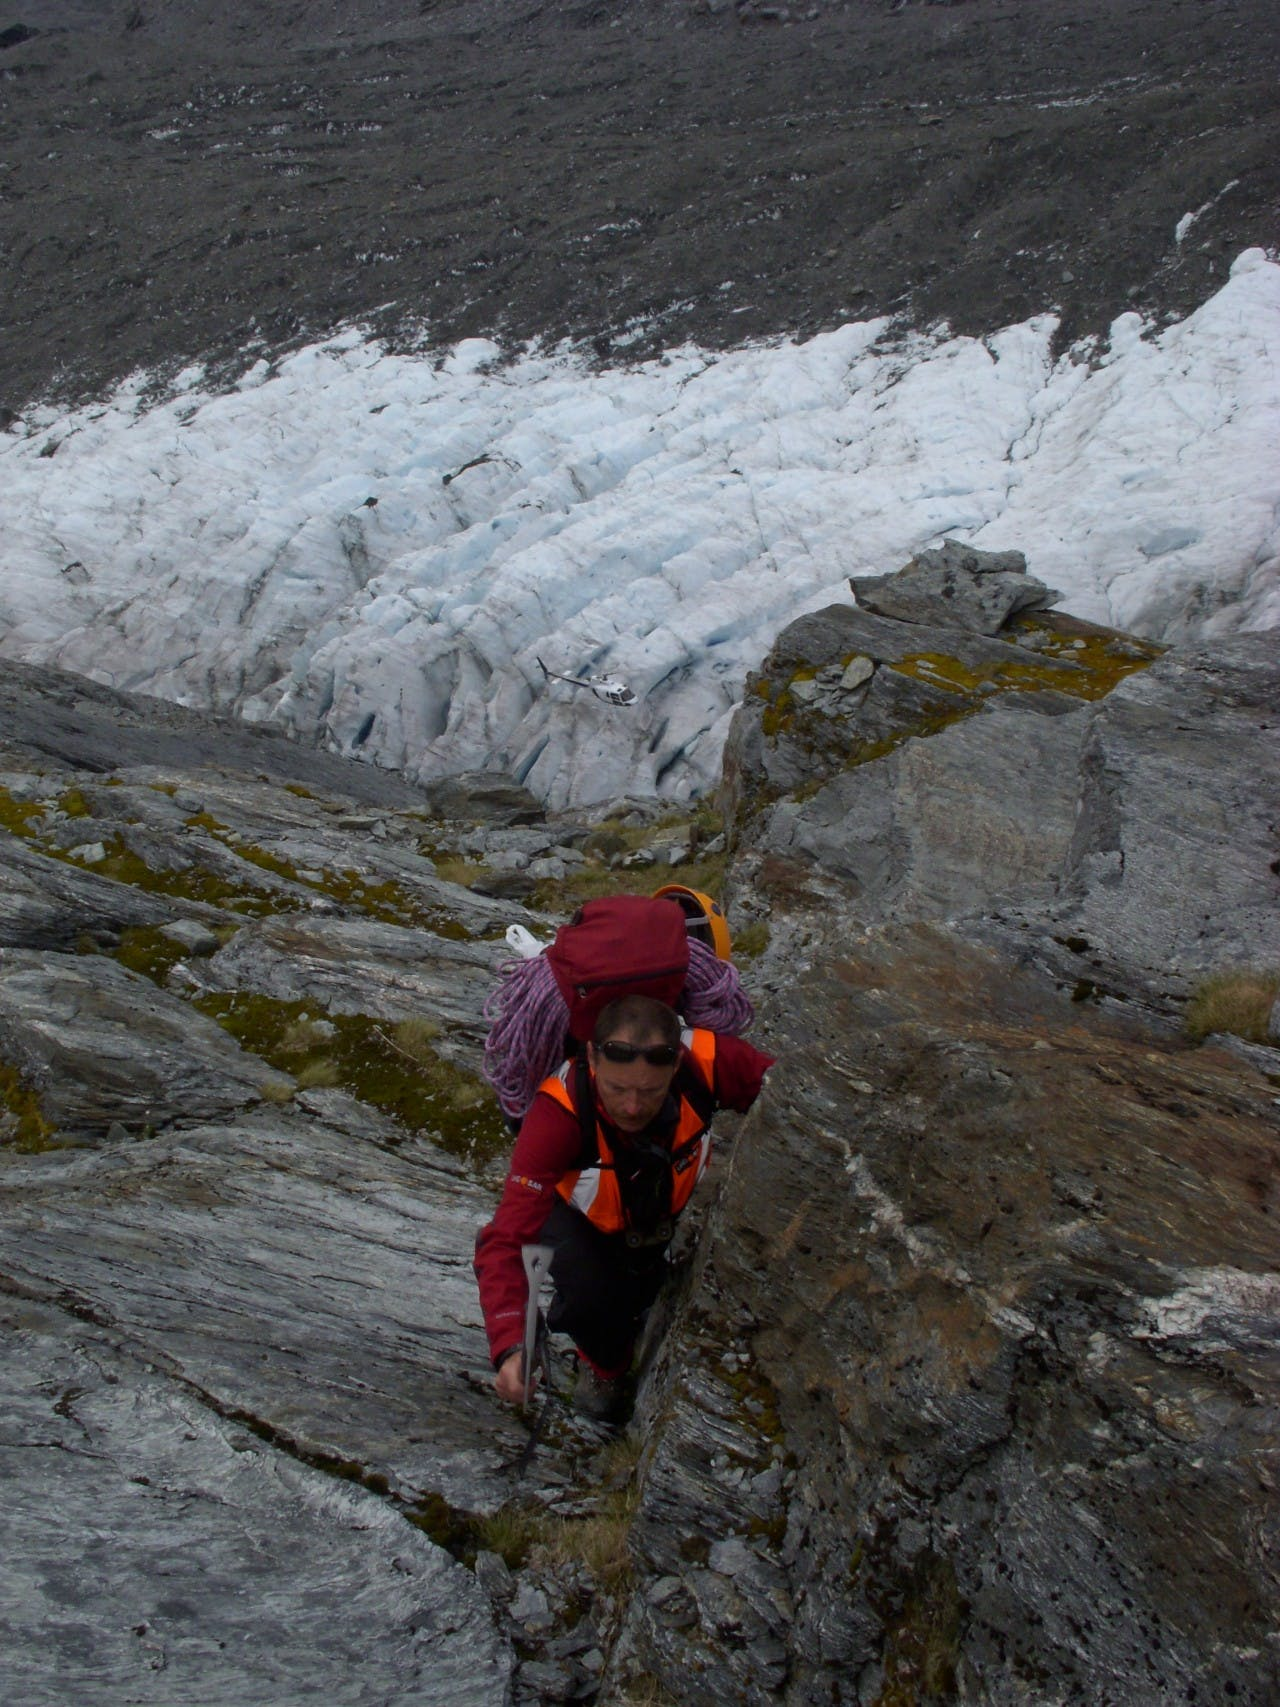 A SAR volunteer climbs above the Dart Glacier on a training exercise